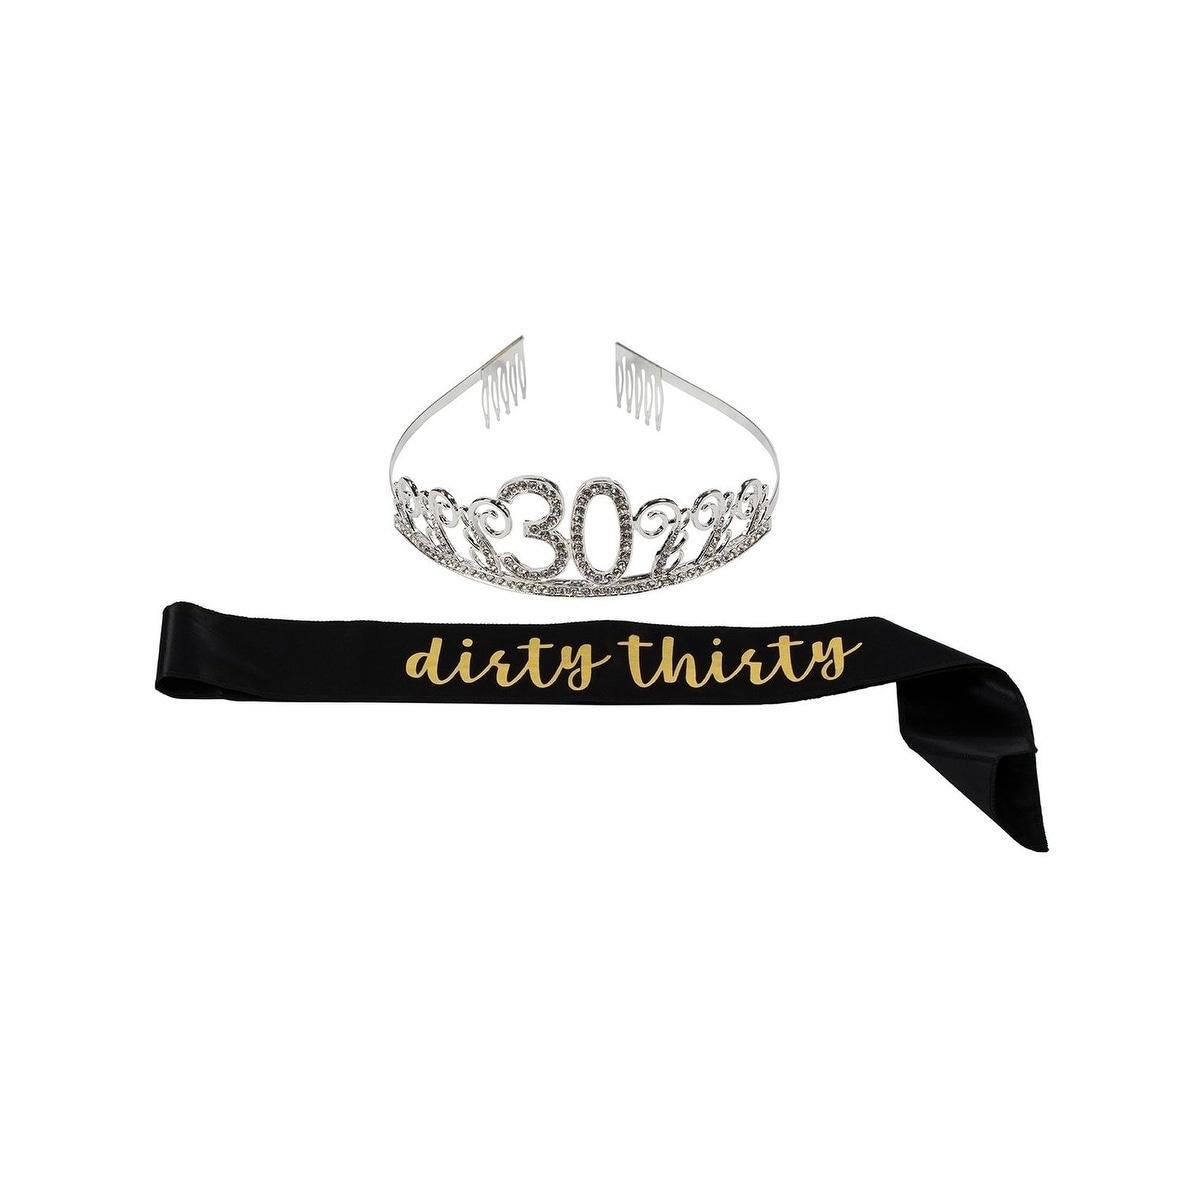 18th Birthday Rhinestone Queen Tiara with It's My 18th Birthday Sash Decoration